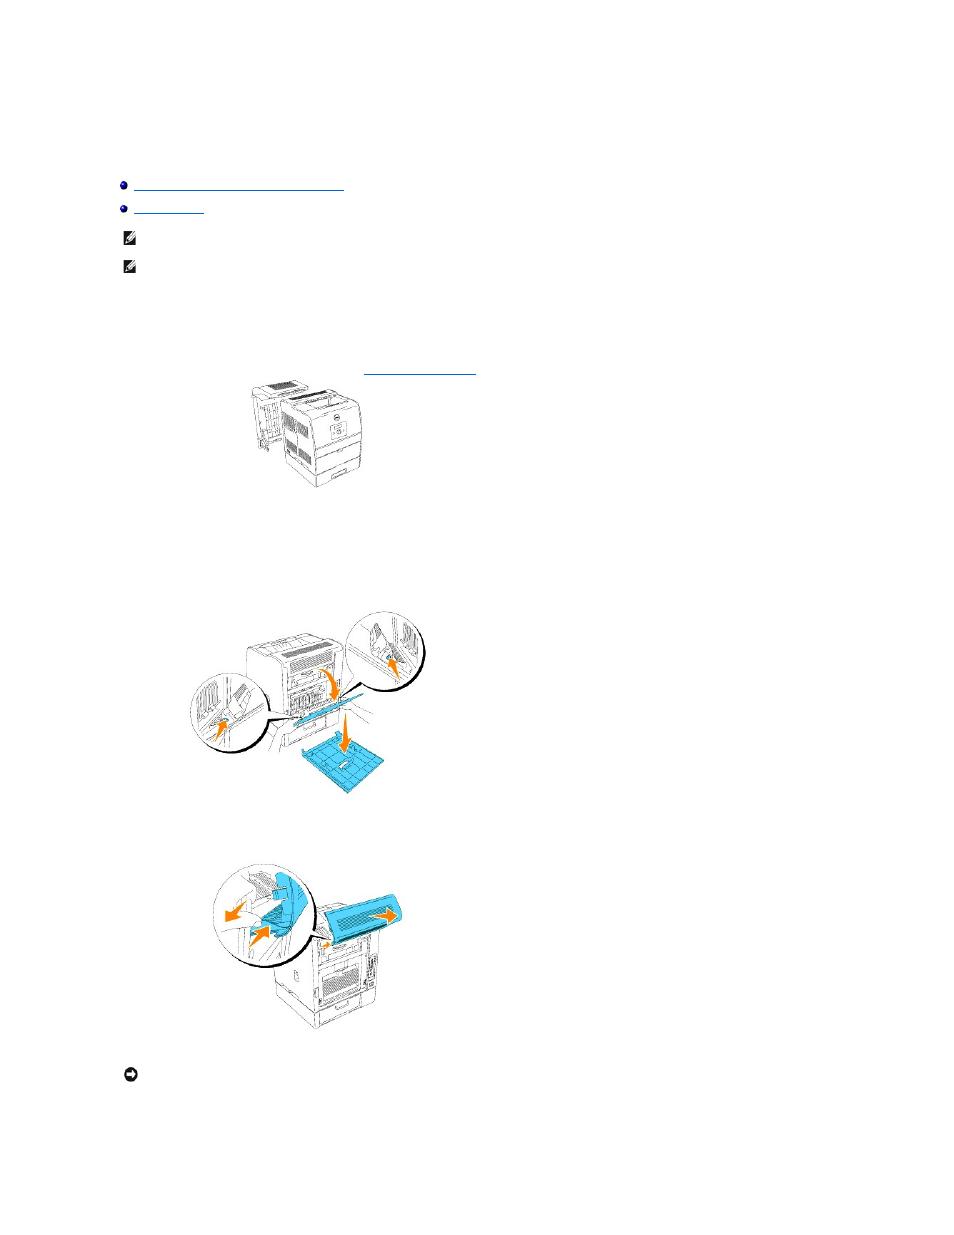 installing the optional duplex module dell 3100cn color laser rh manualsdir com Dell Color Laser Printer 3100Cn dell 3100cn user guide